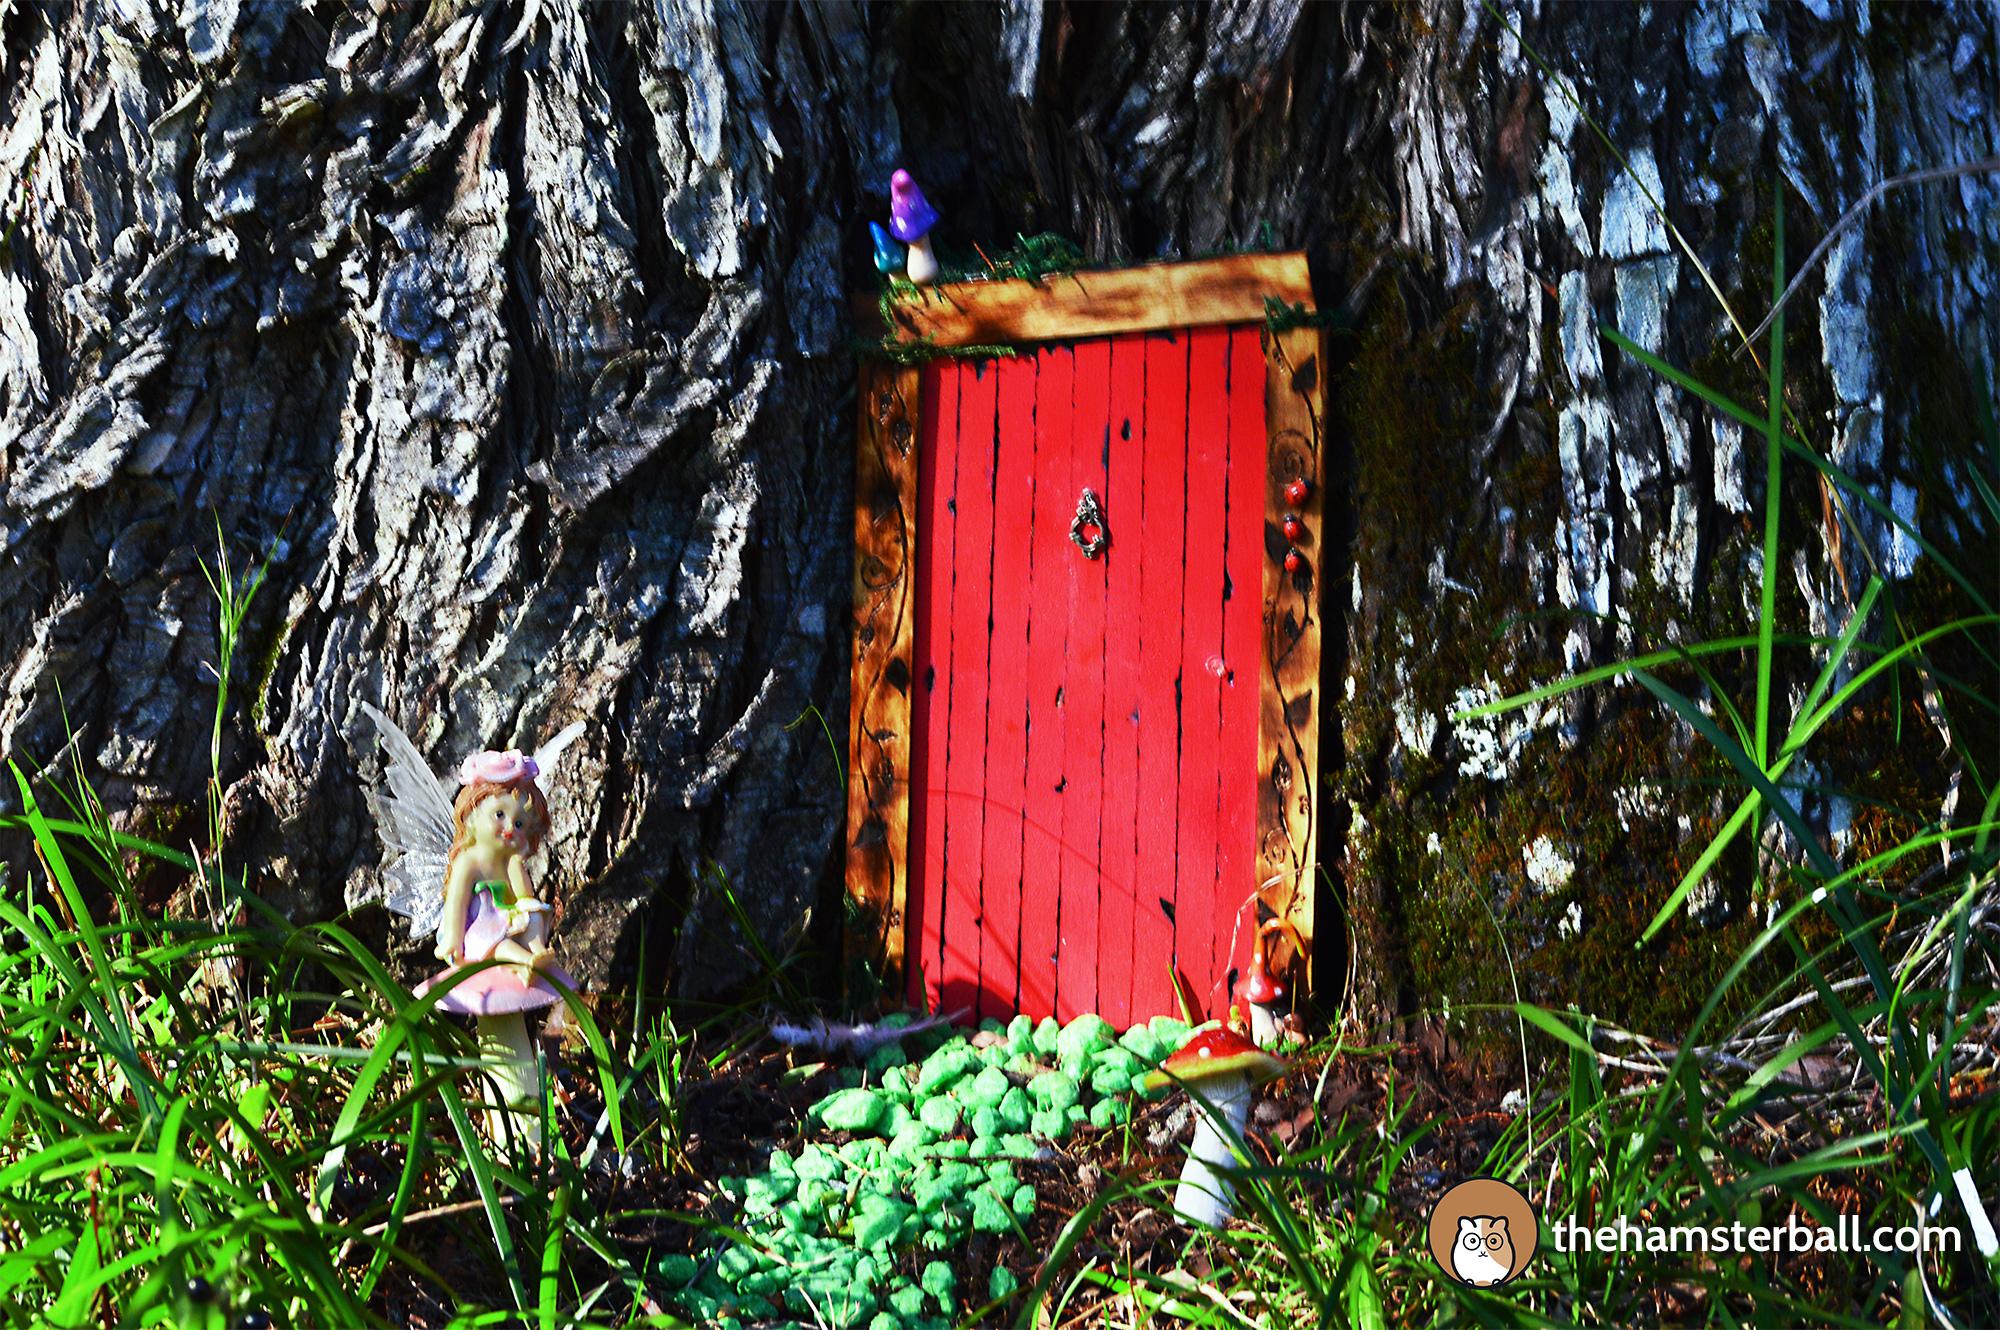 The Fudge Shop, Springbrook, Eco Sensitive, environment, red door, tree, fairy, mushroom